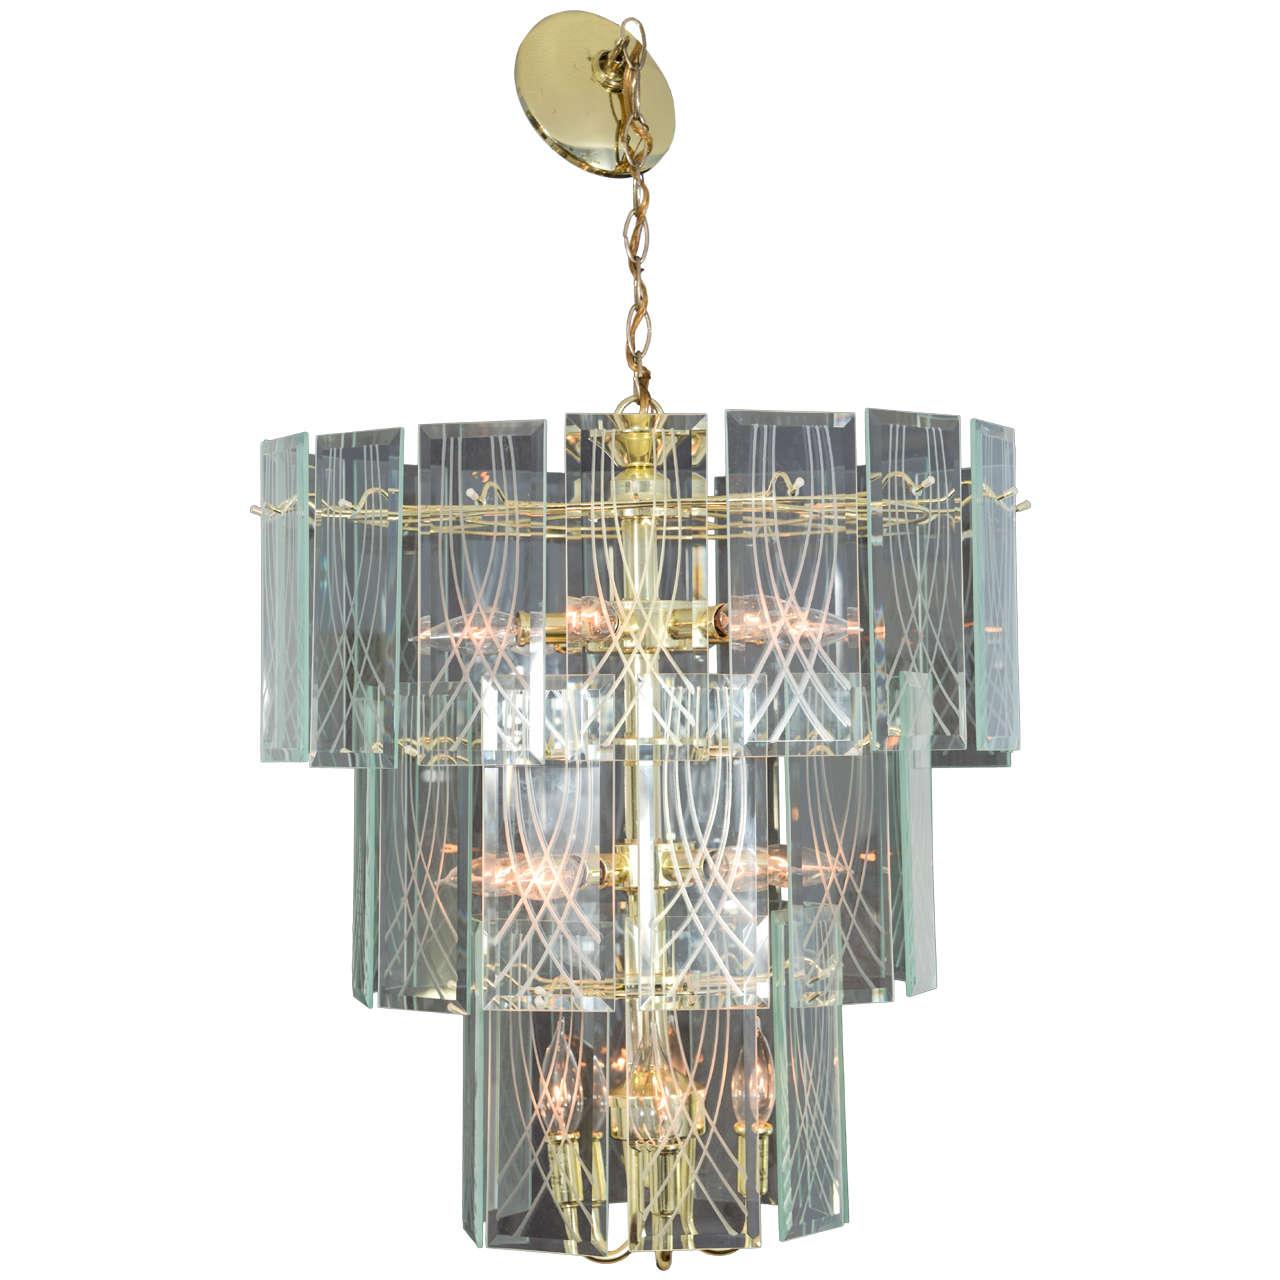 Lightolier Chandelier Pendant 1970s Vintage Three Tier American Modern Brass Glass Chandelier Vintage Chandelier Chandelier For Sale